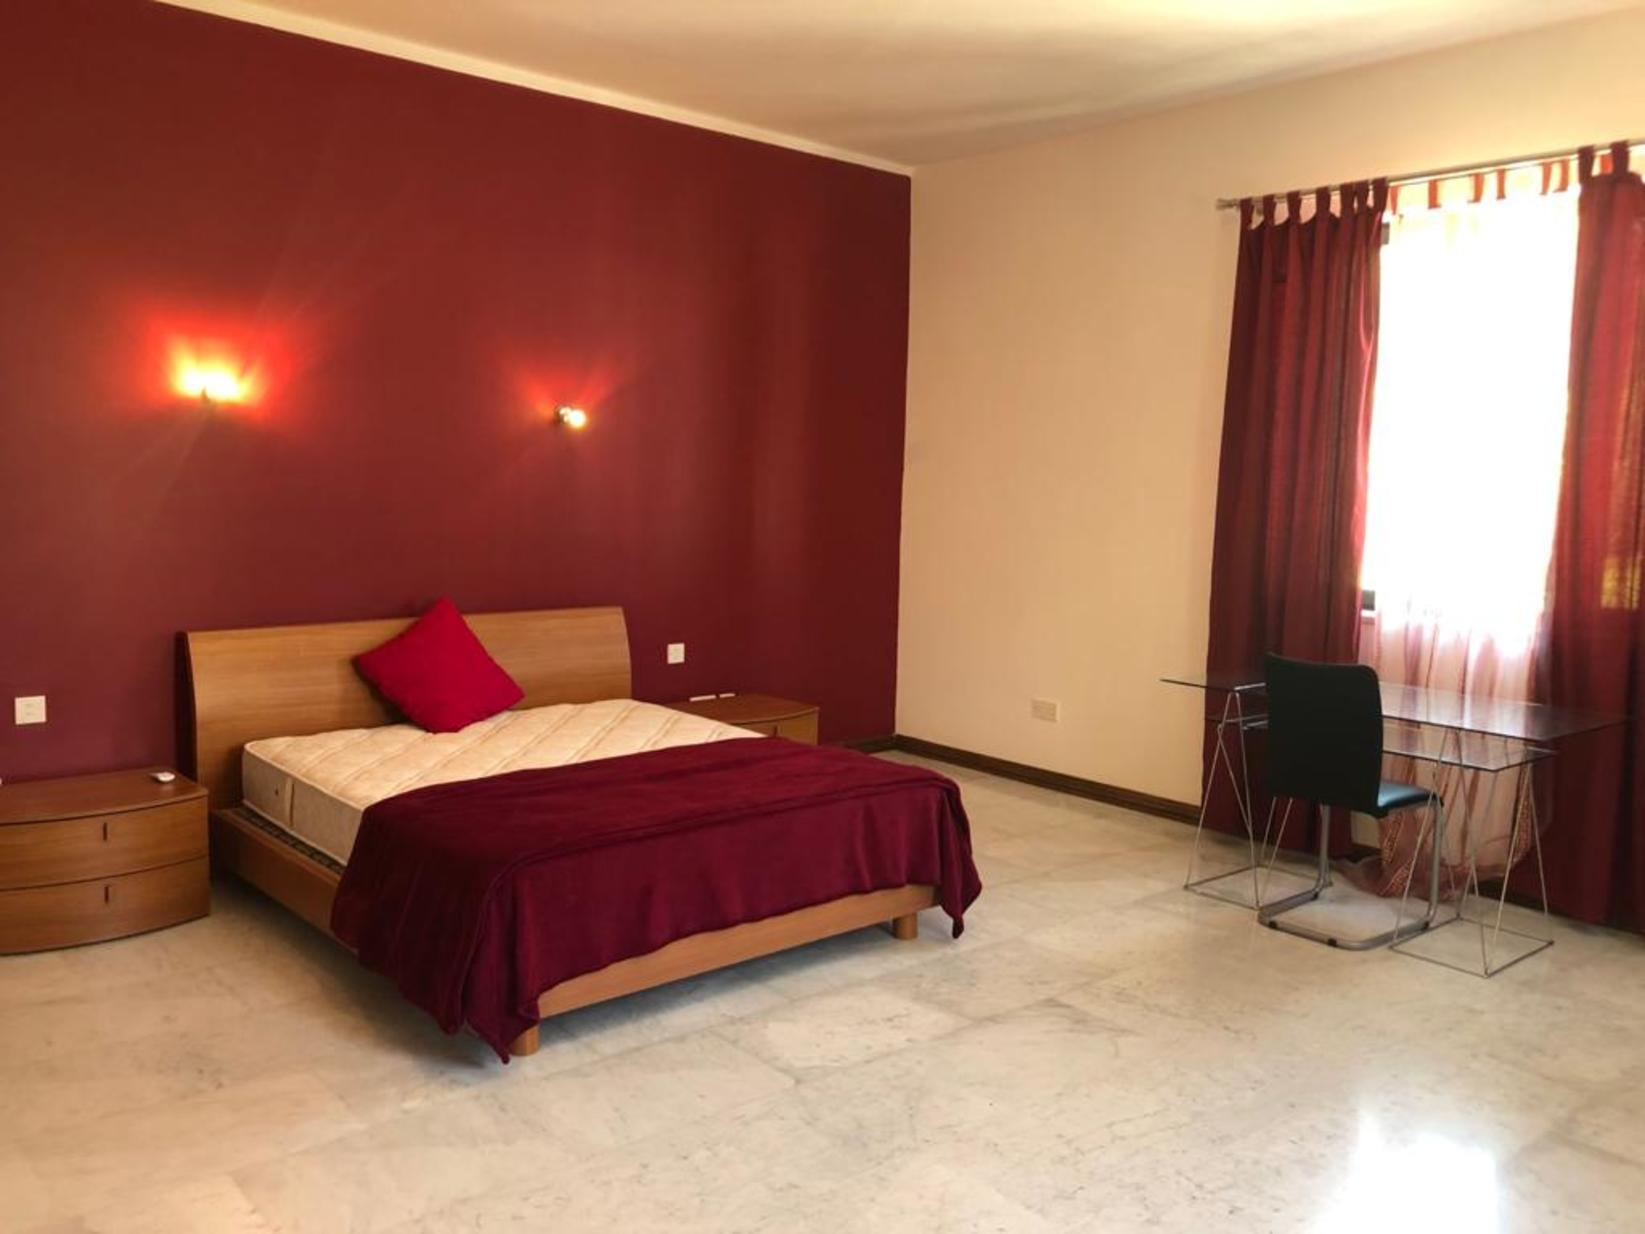 6 bed Villa For Rent in Mellieha, Mellieha - thumb 7